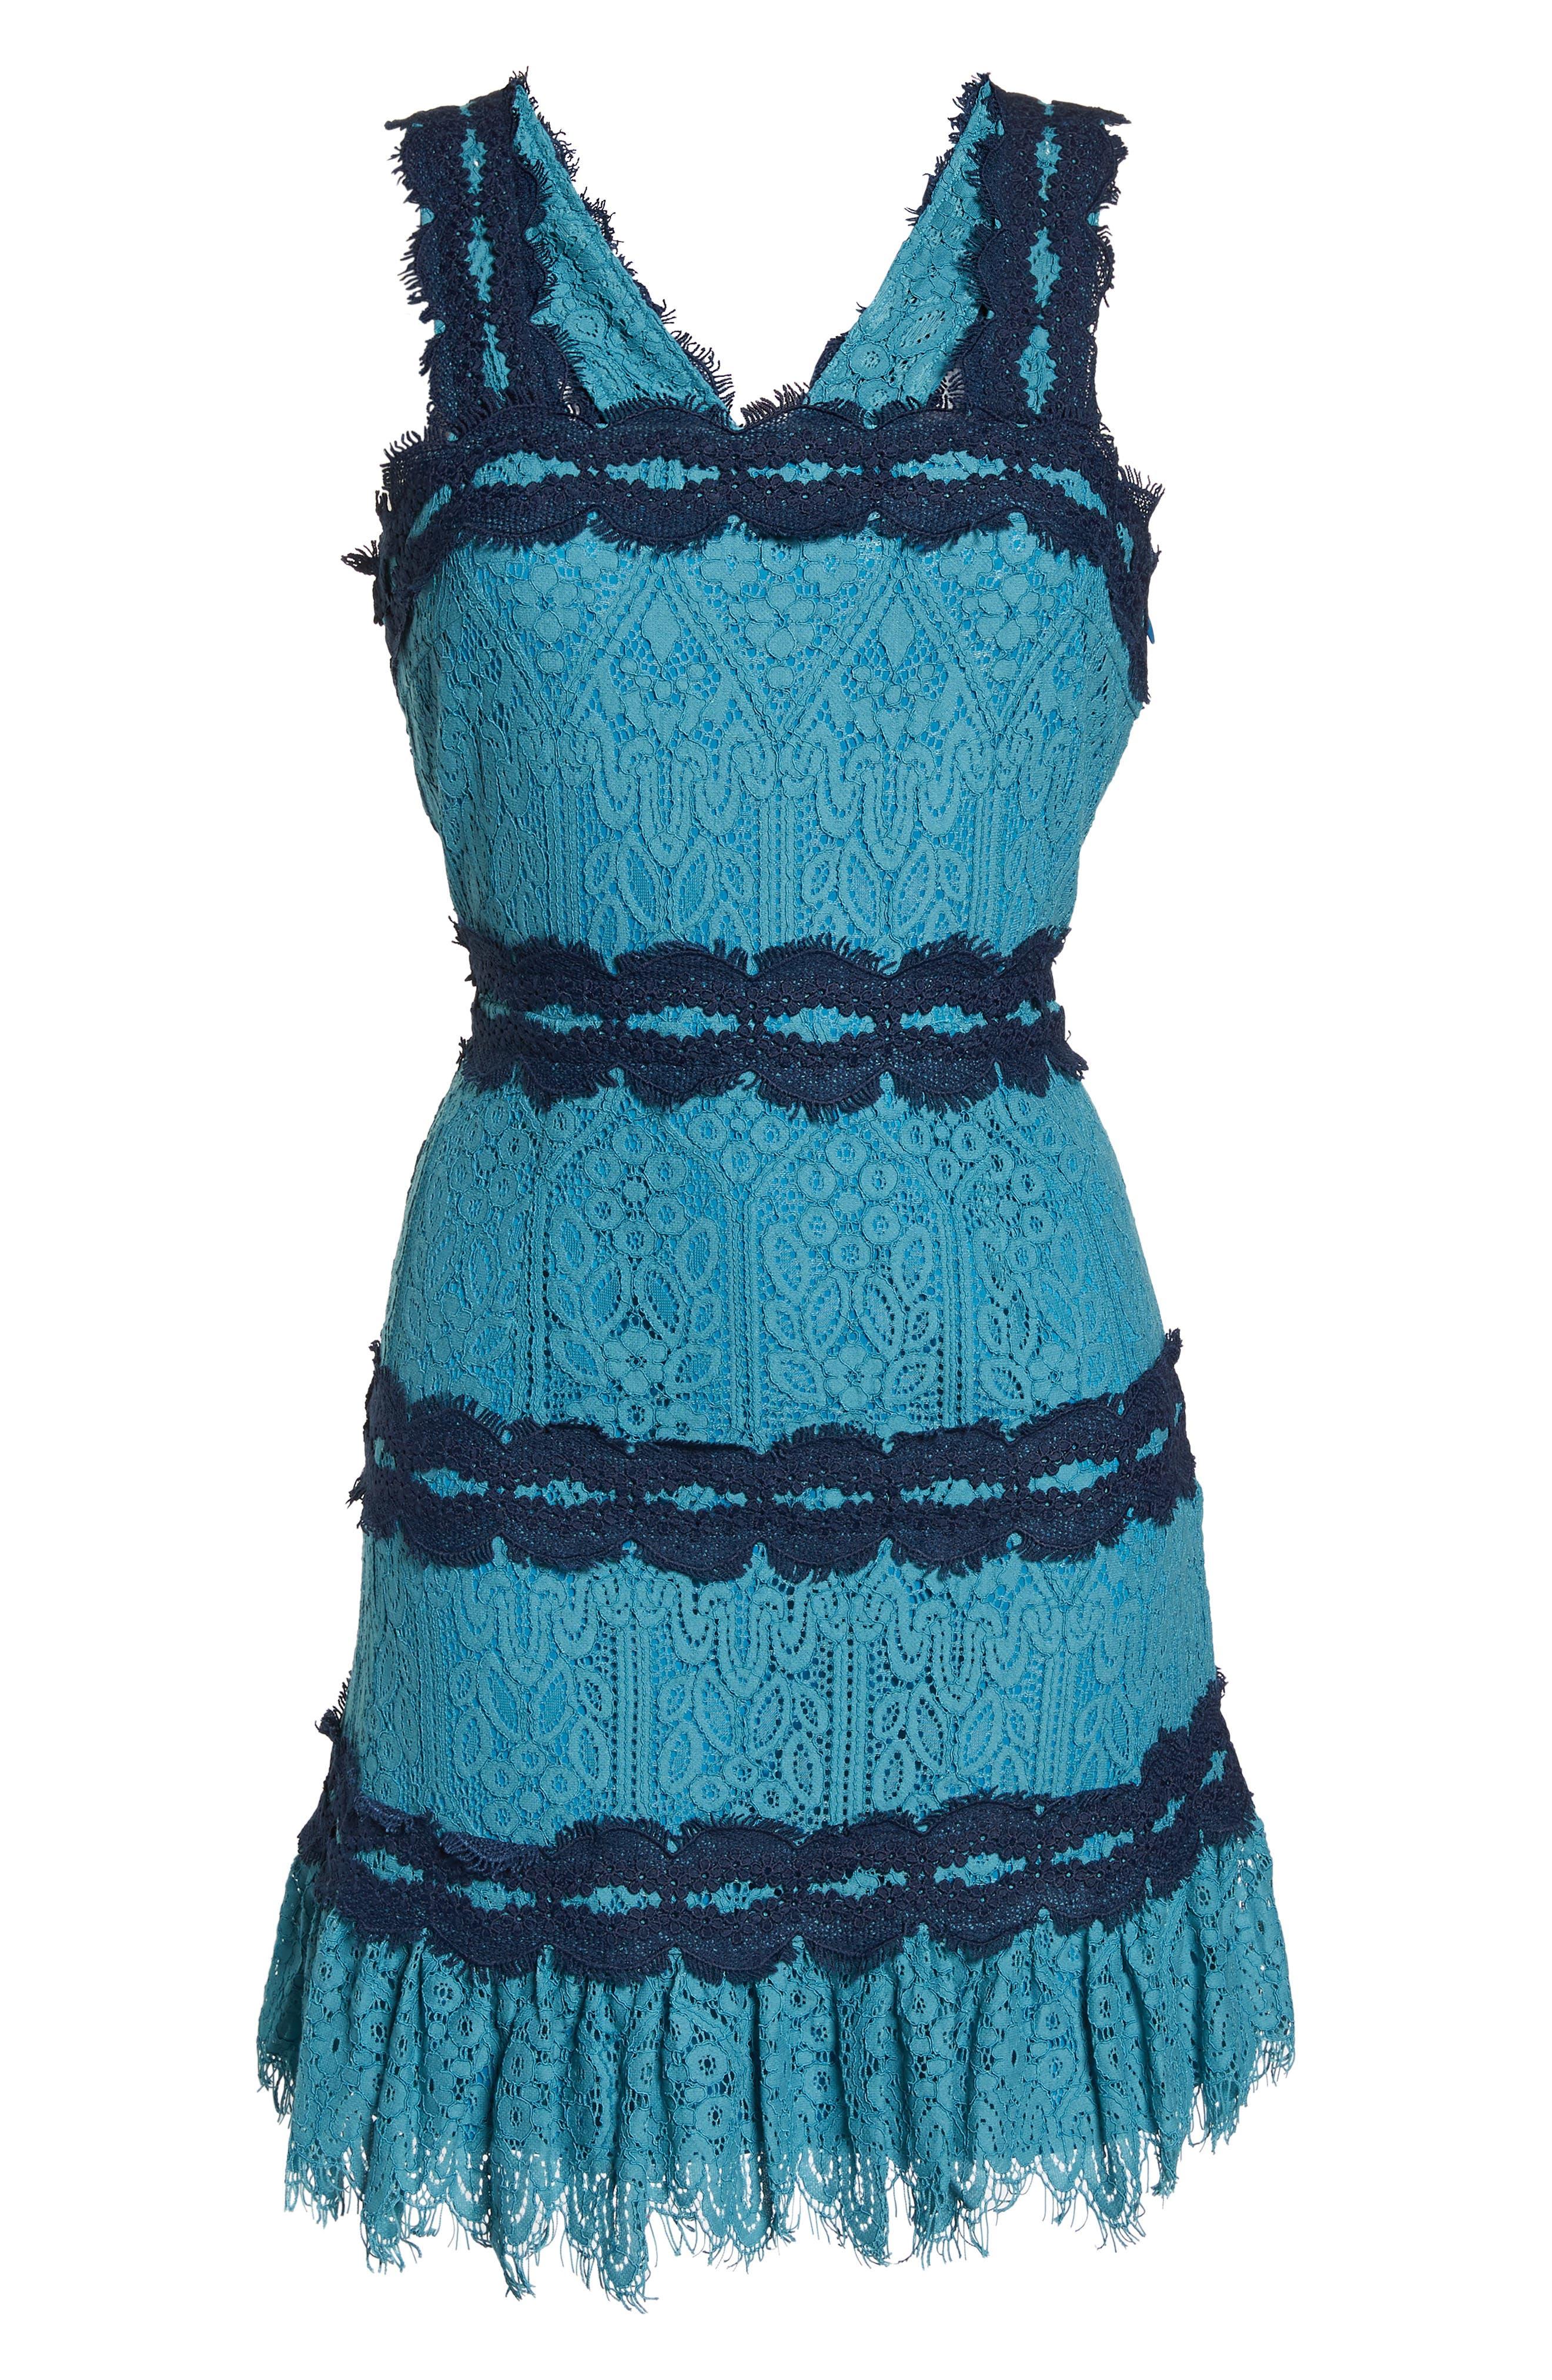 Lula Ruffle Lace Dress,                             Alternate thumbnail 7, color,                             TEAL/ NAVY